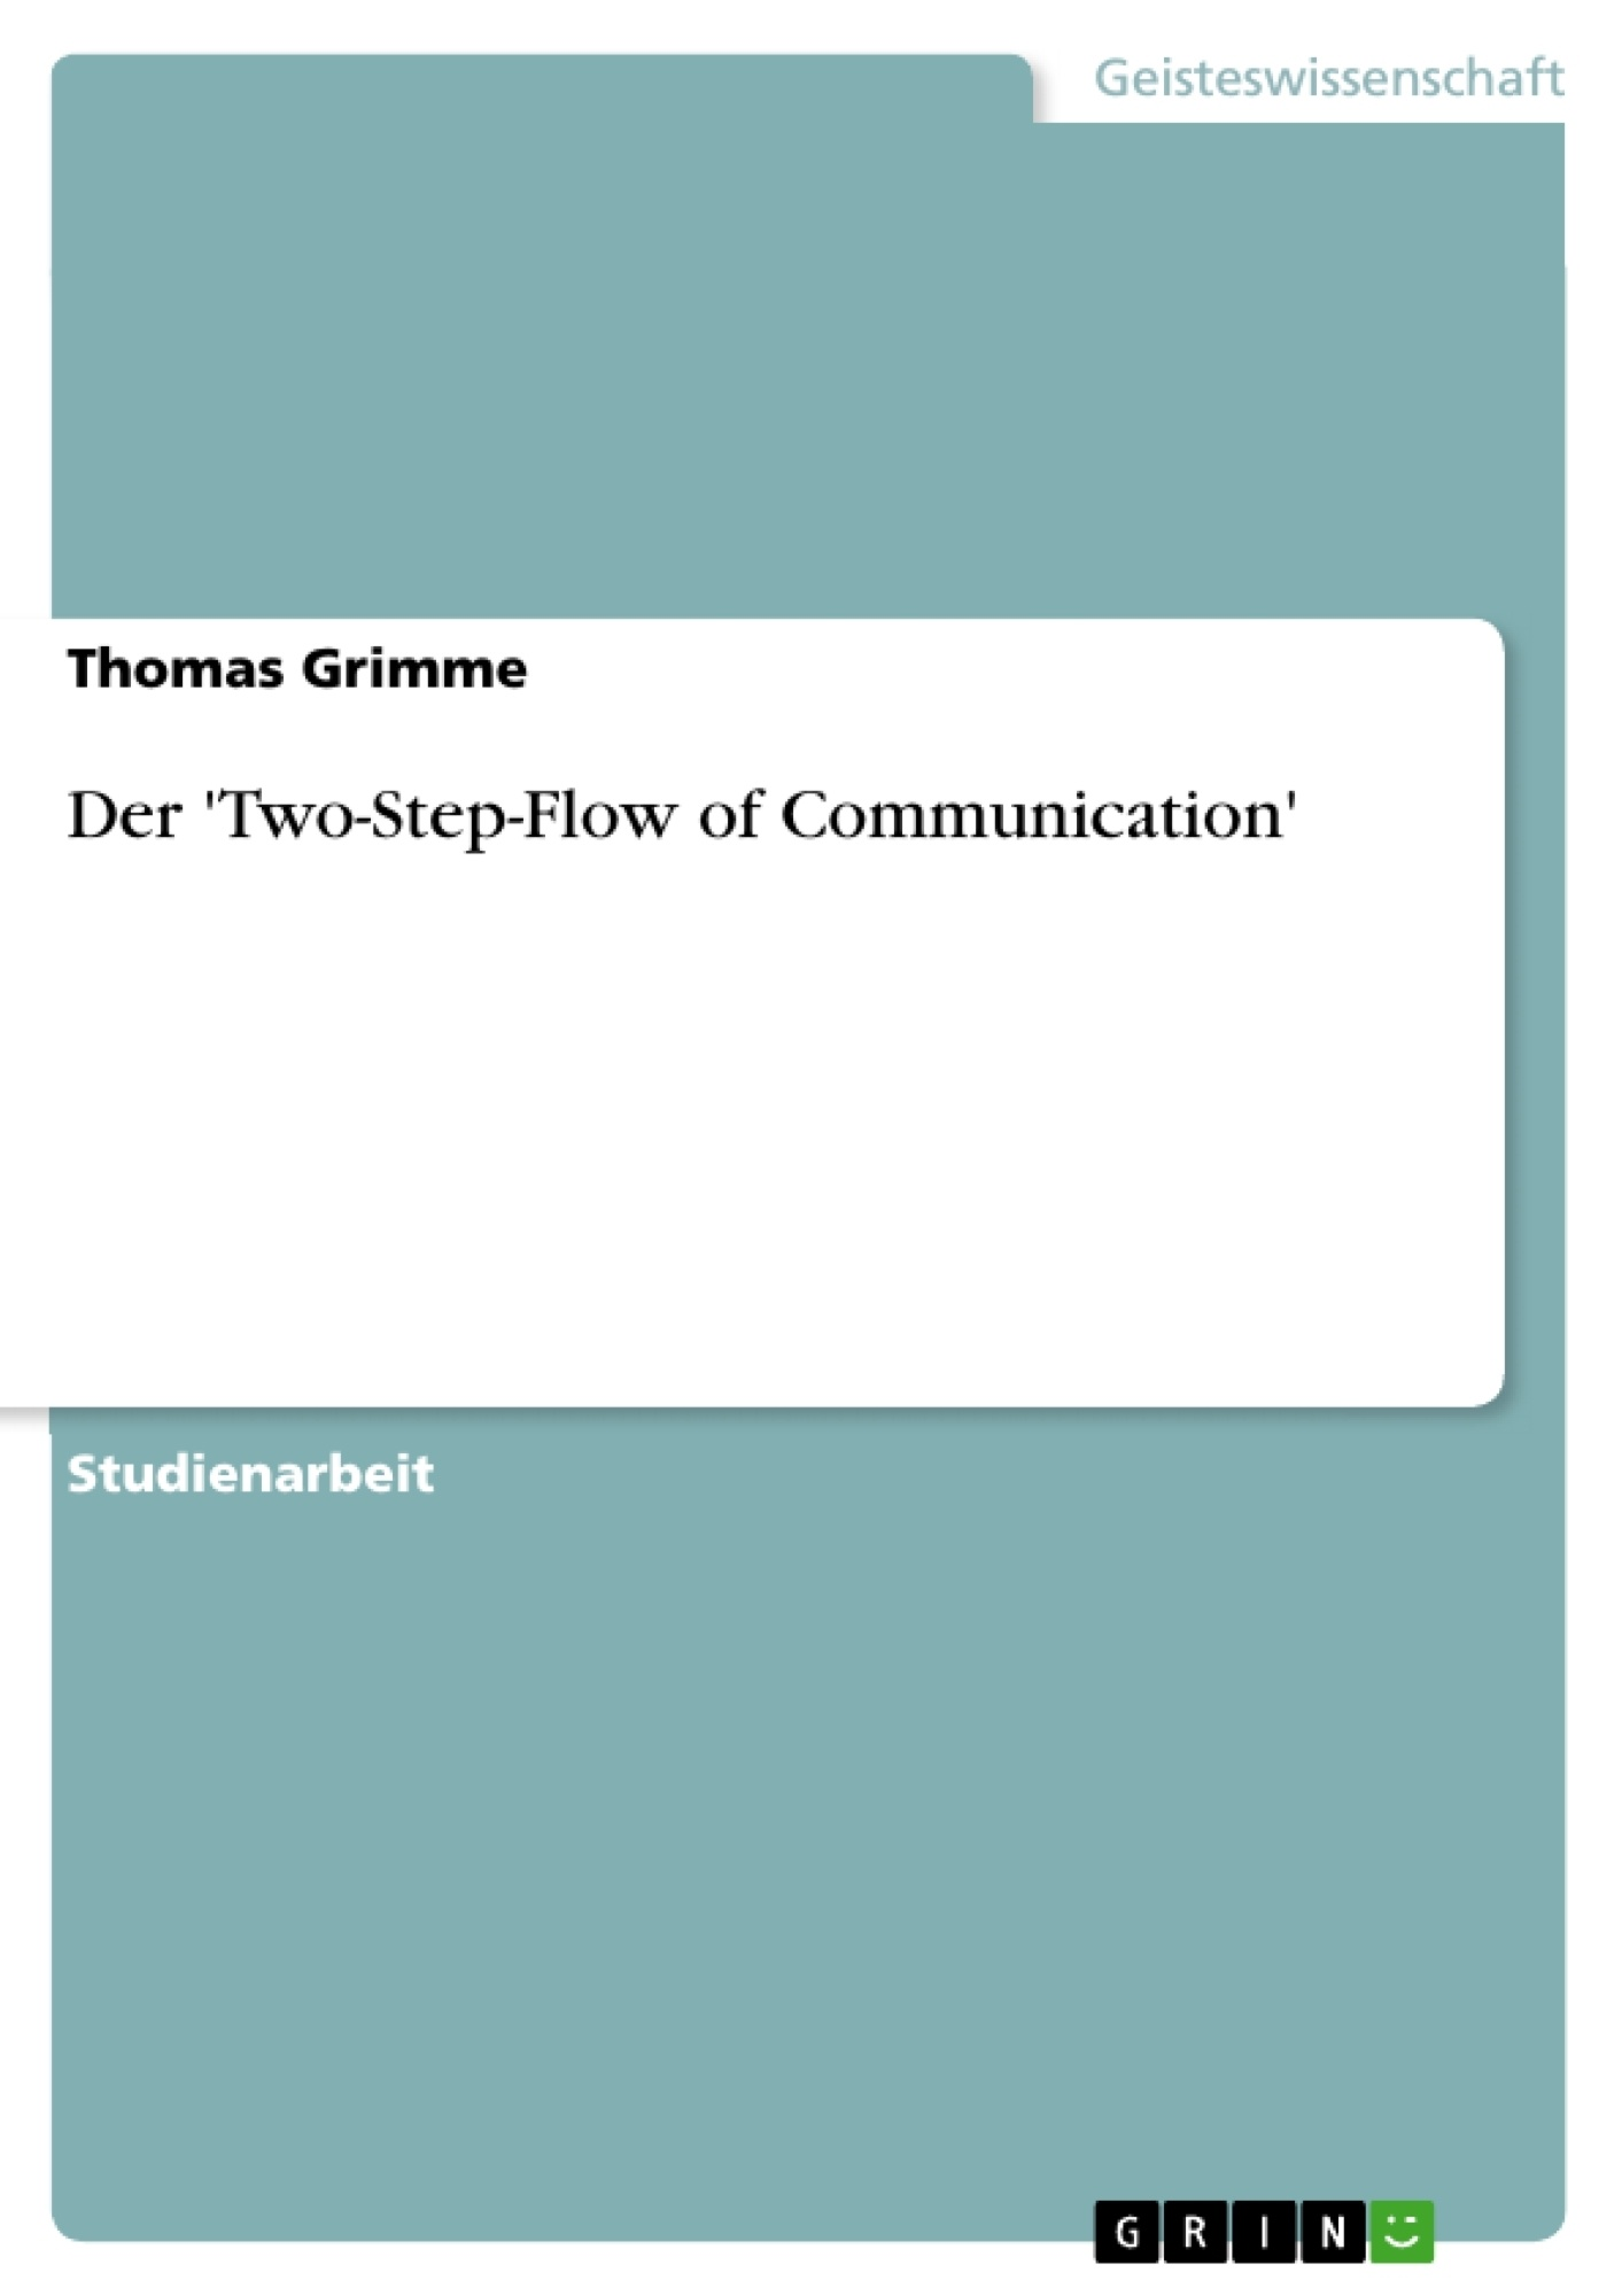 Titel: Der 'Two-Step-Flow of Communication'